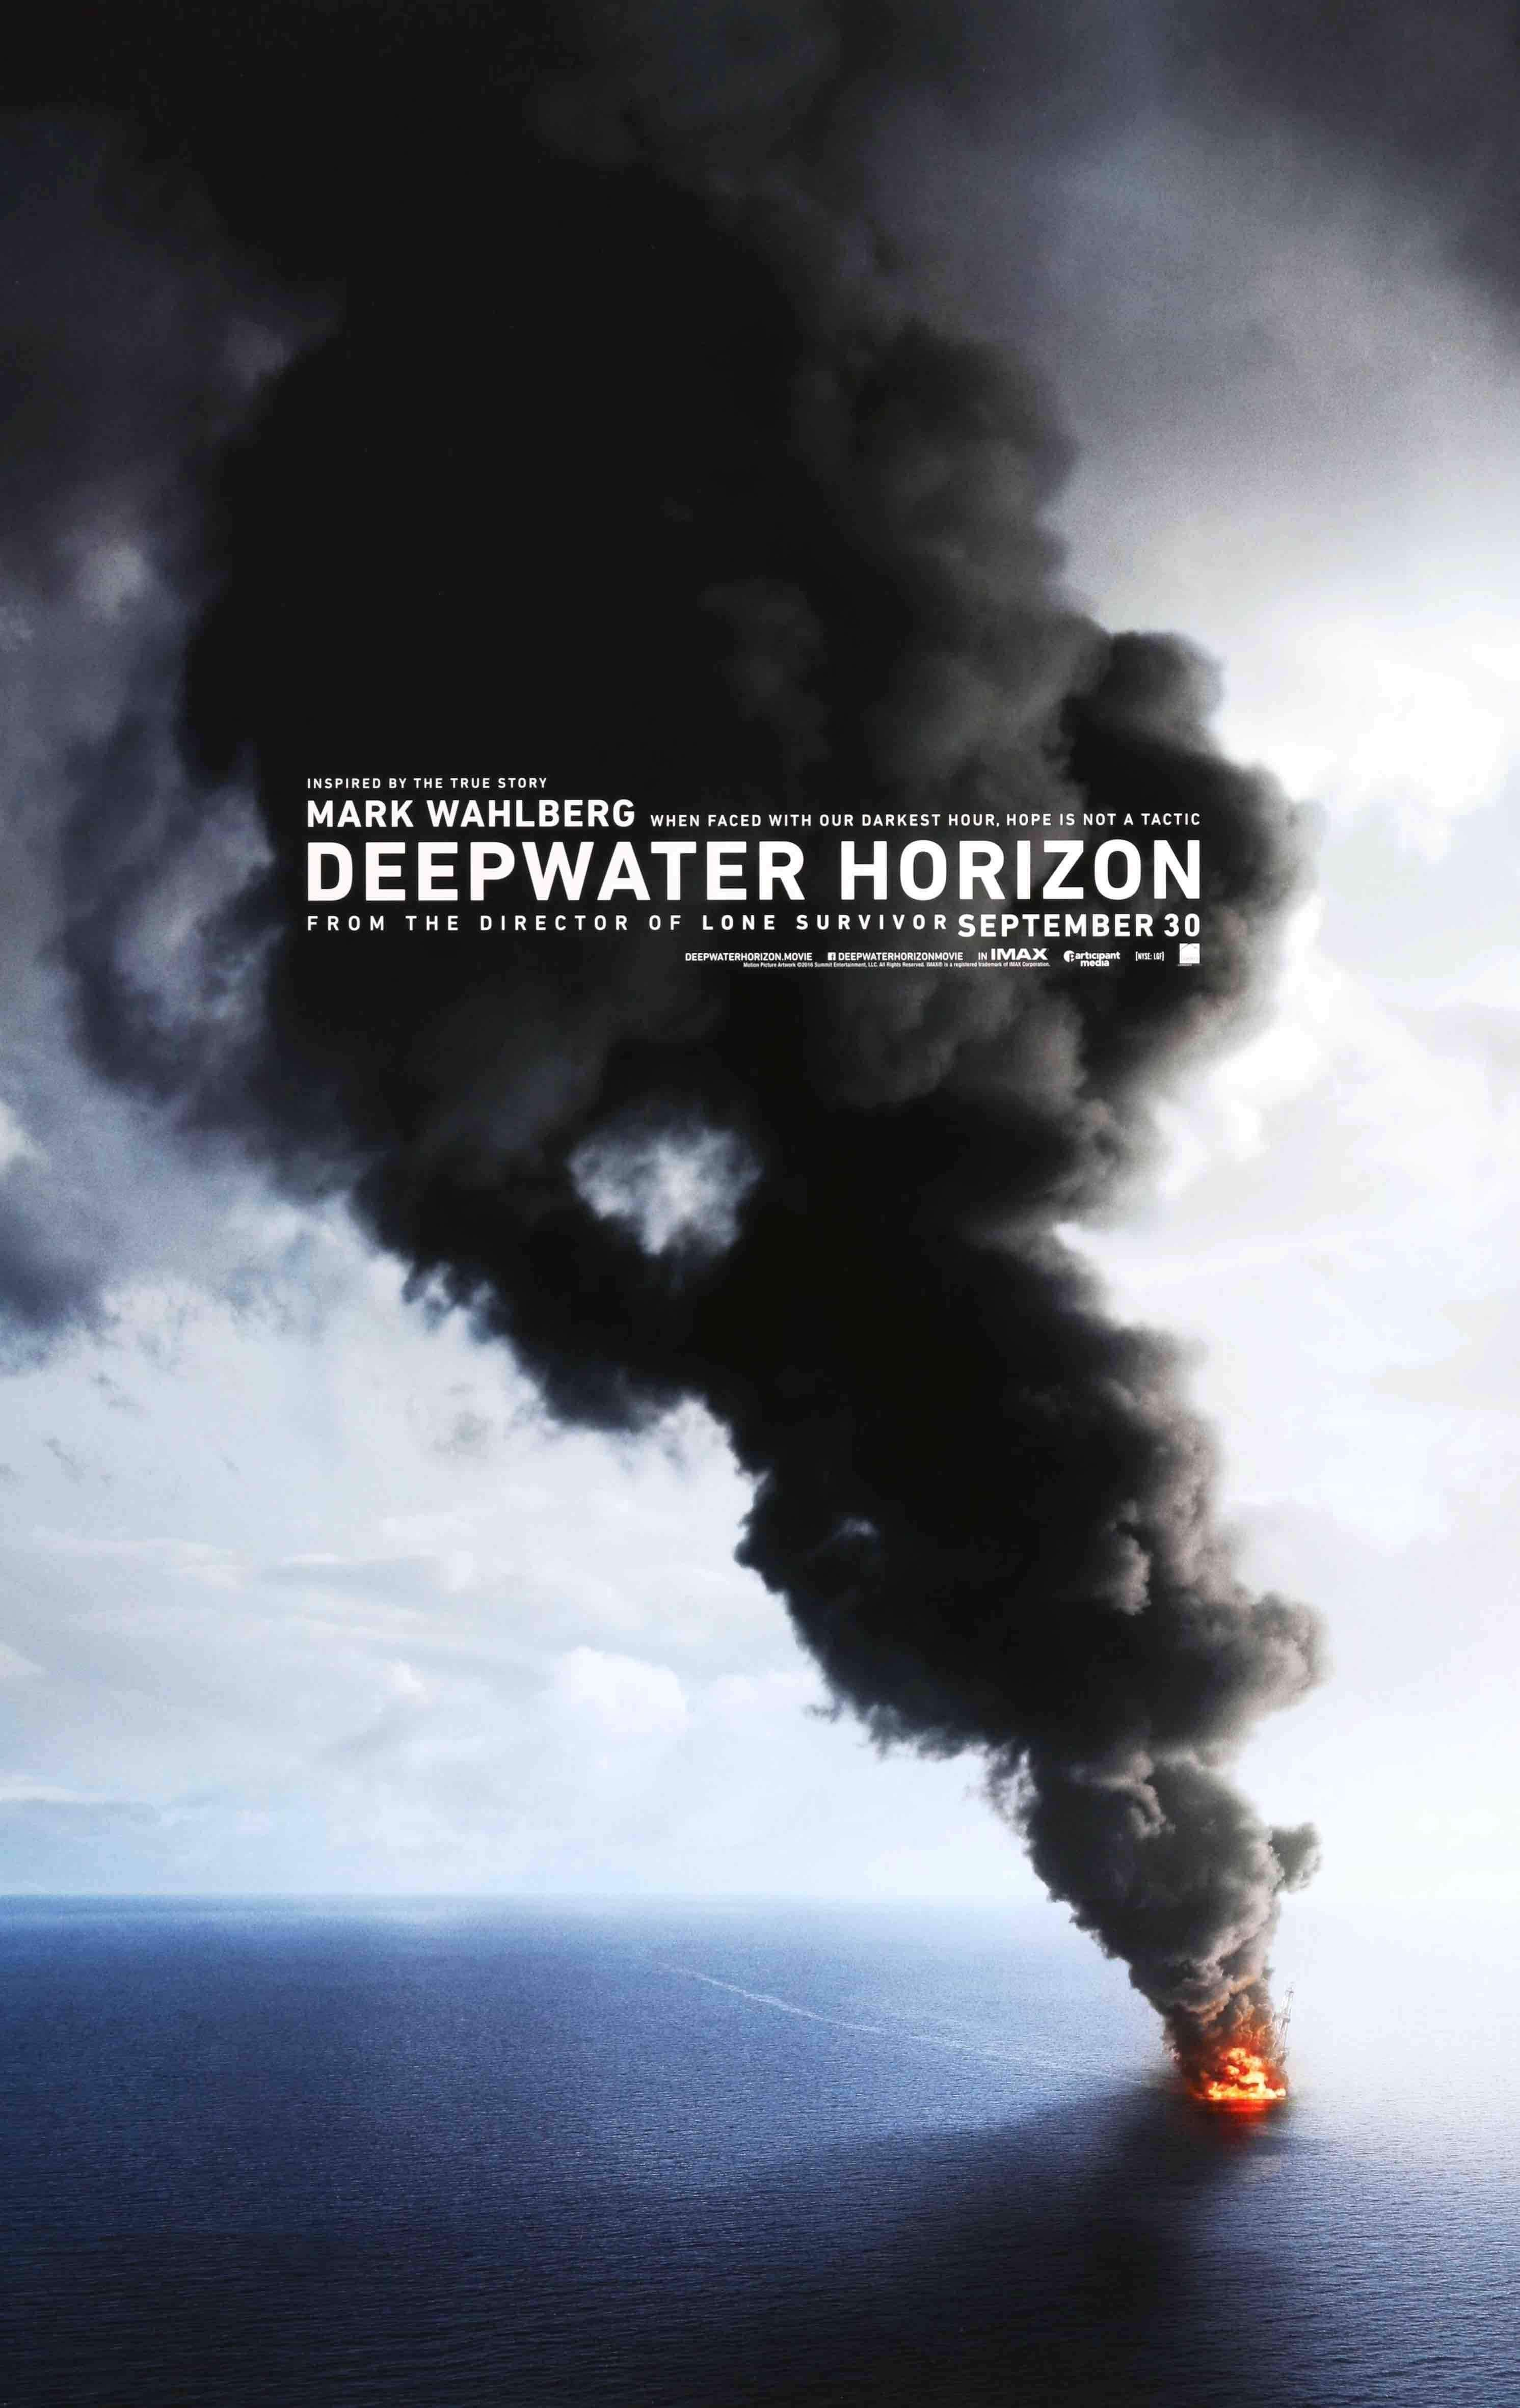 deepwater horizon 2016 ポスター 映画 海